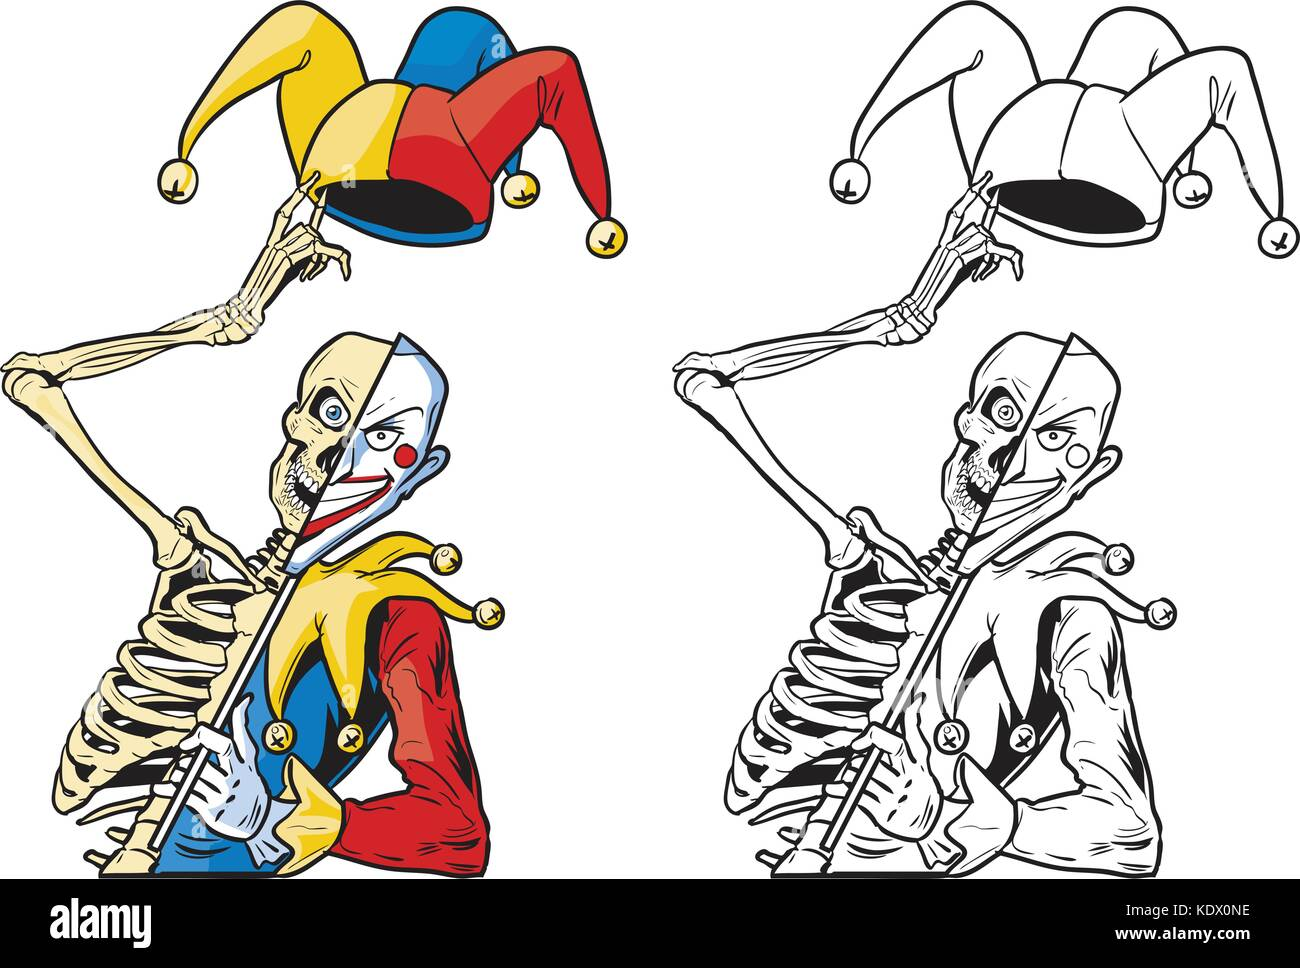 Vector cartoon clip art illustration of a scary half skeleton half joker or jester or harlequin tipping his hat - Stock Vector